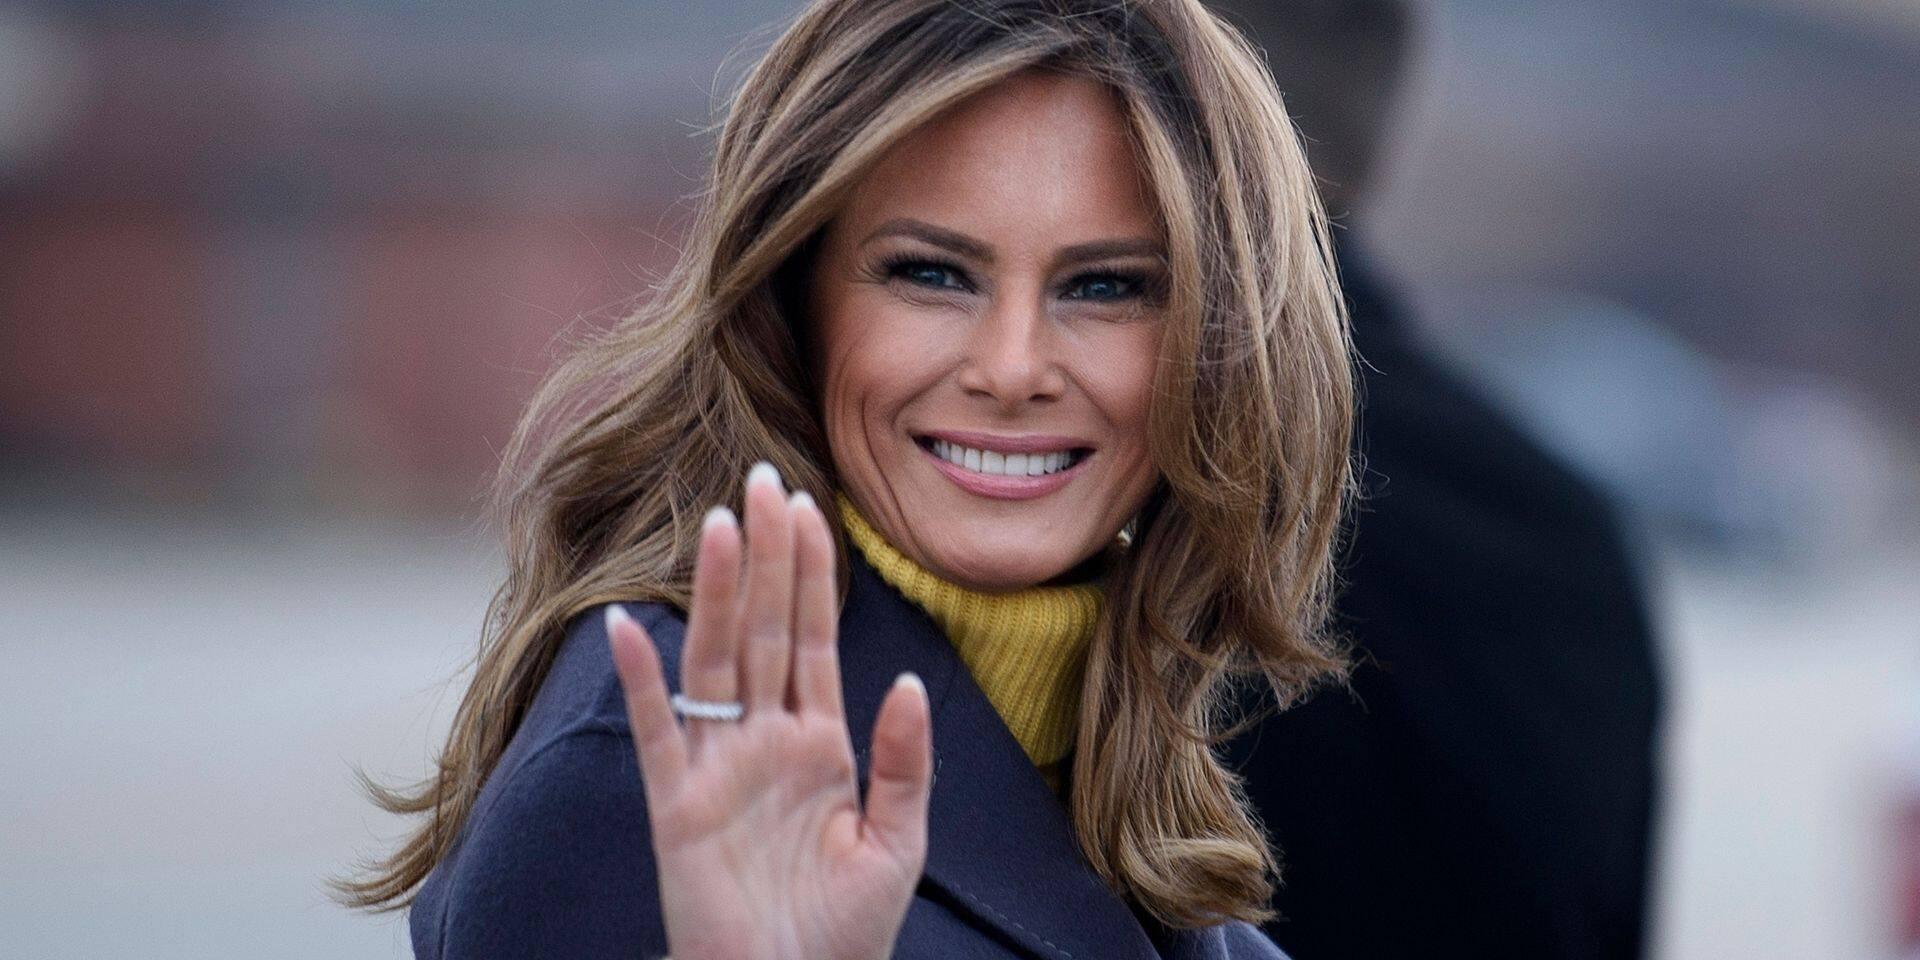 Chambre à part avec Donald Trump, relations tendues avec Ivanka: Melania racontée dans un livre